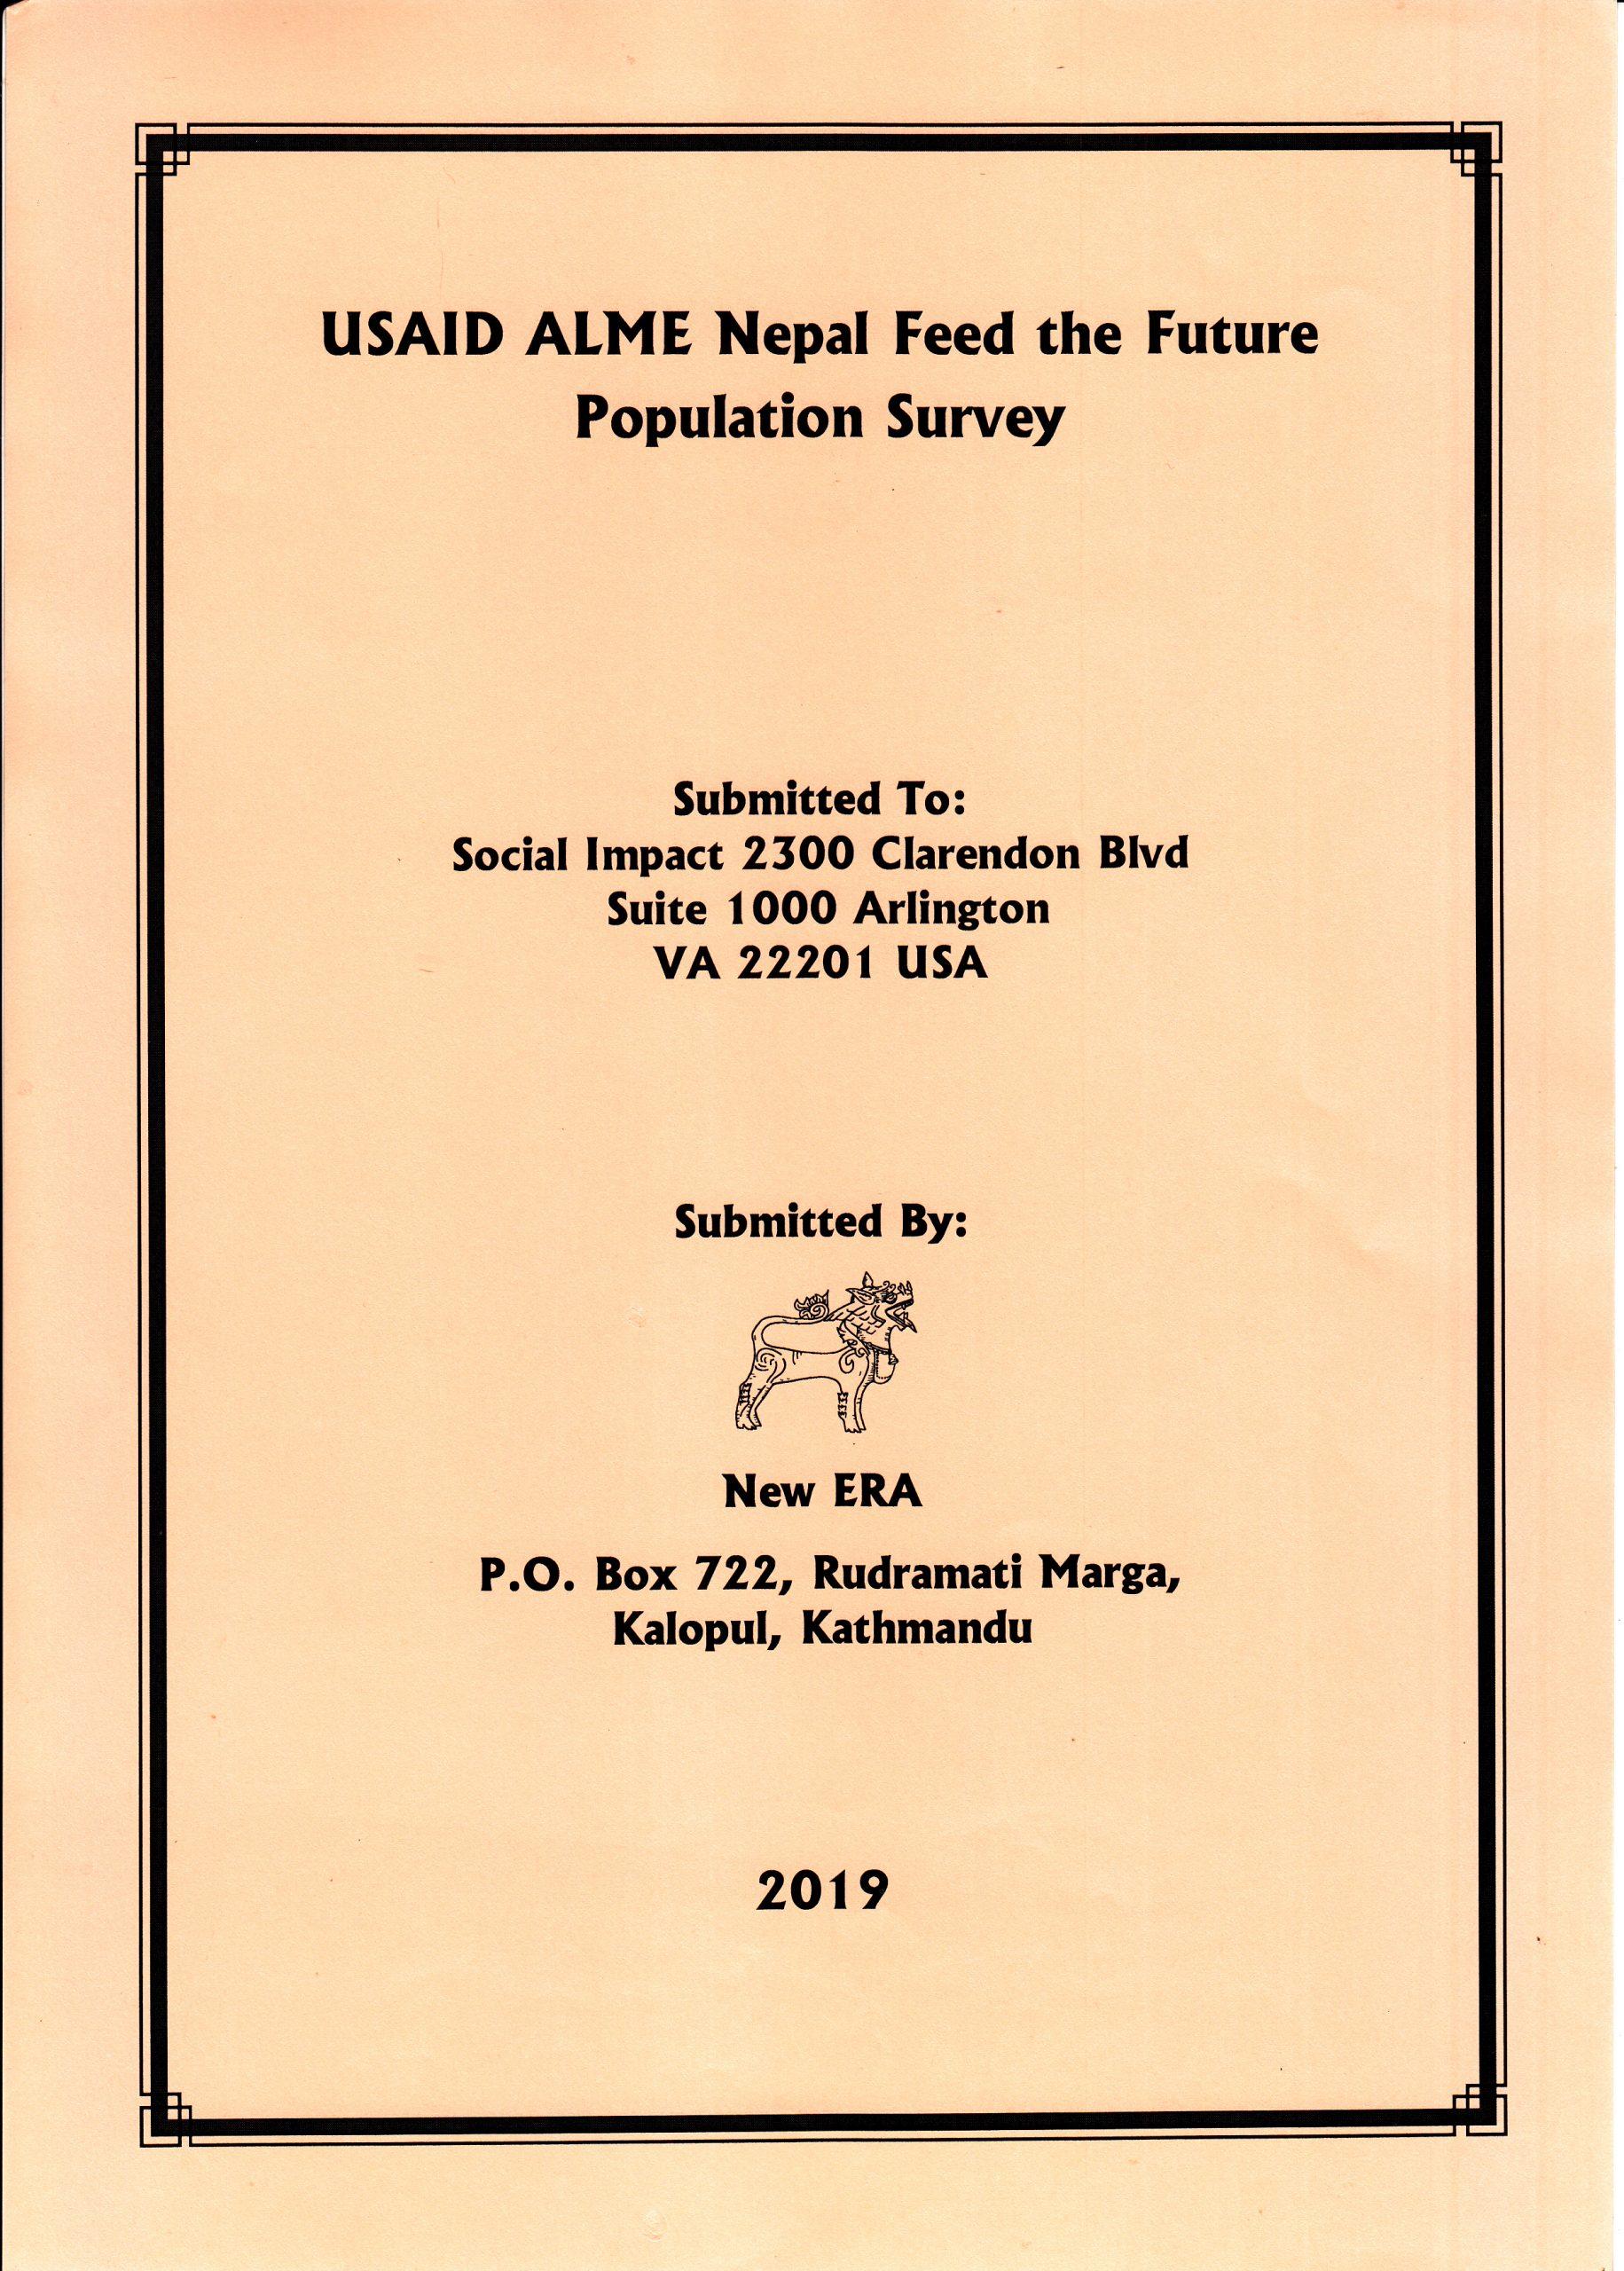 USAID ALME Nepal Feed the Future Population Survey